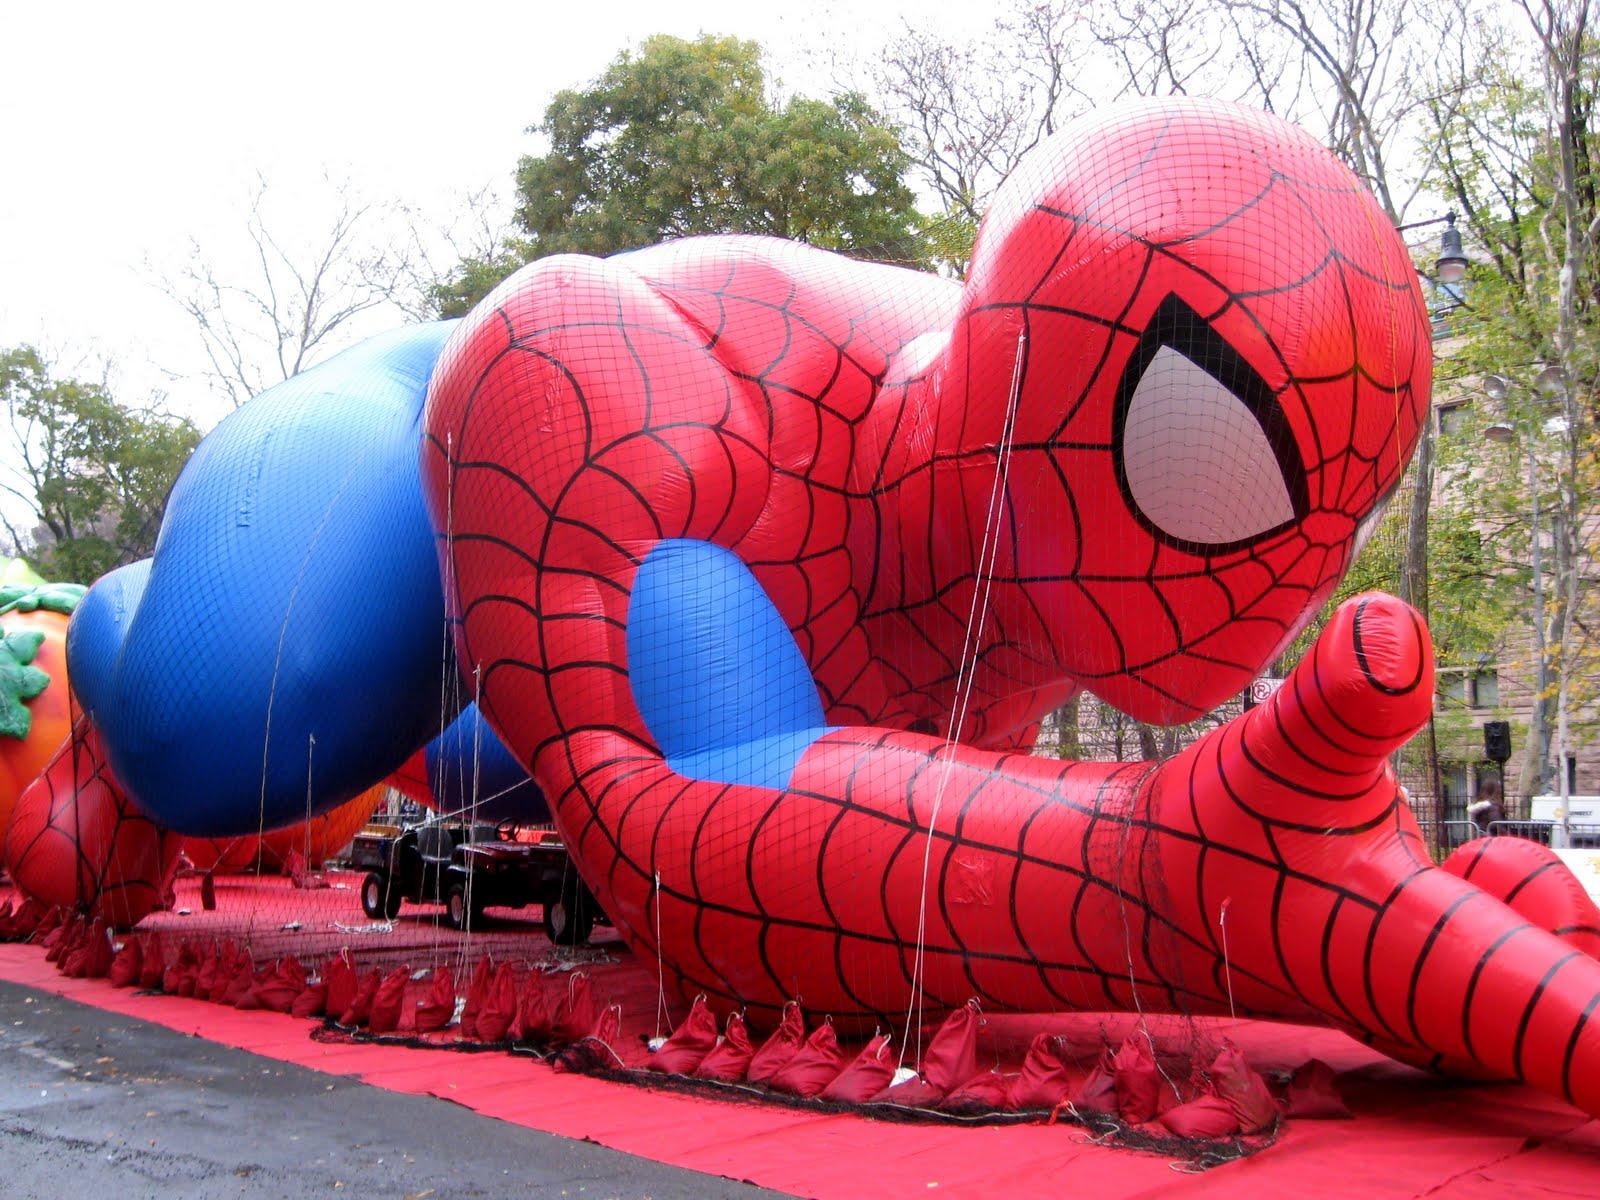 http://2.bp.blogspot.com/_TZ4zYEBSw1I/Sw3Gq2mLg6I/AAAAAAAALJ0/D0pSjTkTjuI/s1600/spiderman.jpg